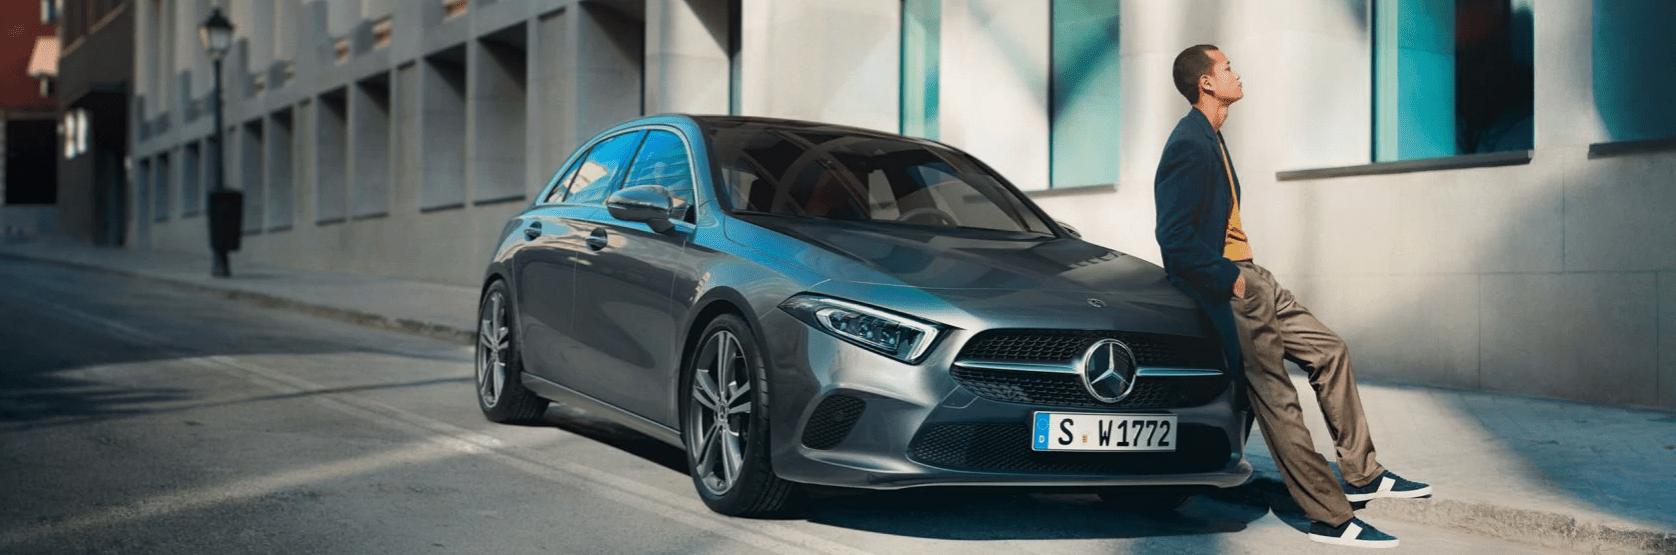 Дизайн Mercedes А-class